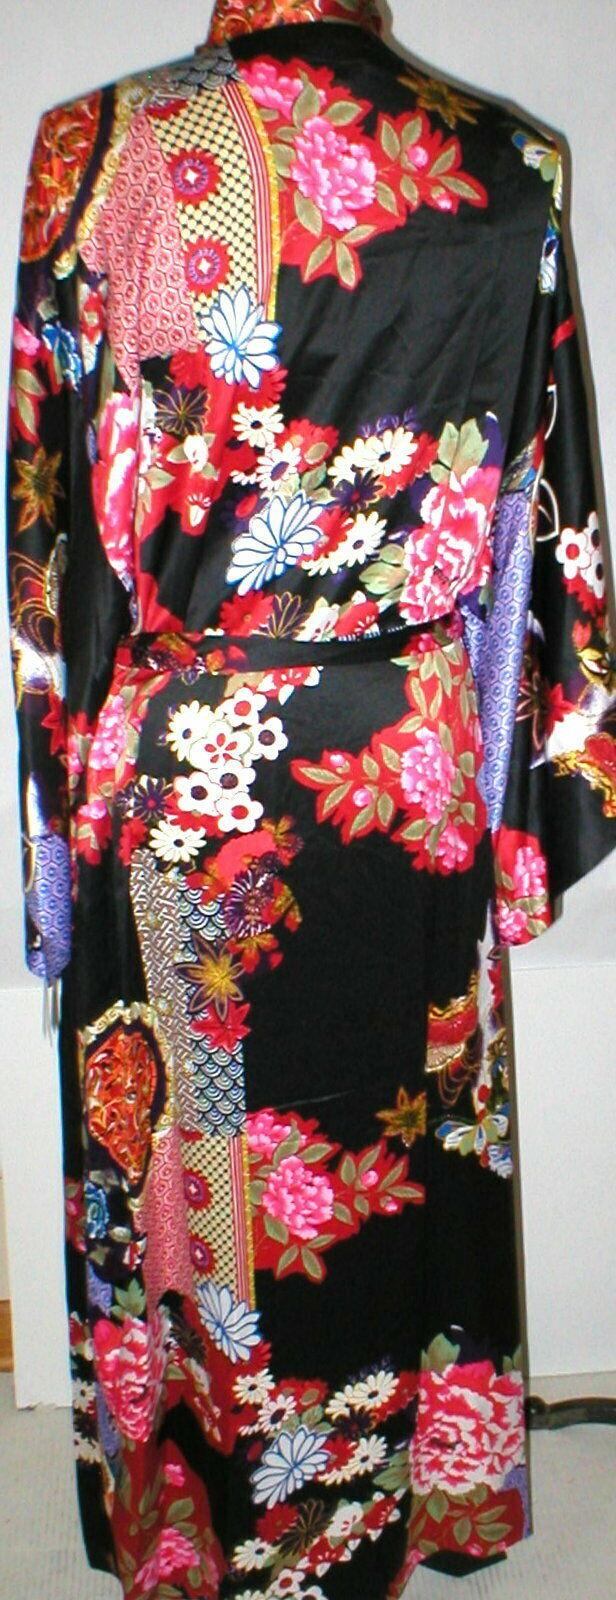 NWT New Designer Natori Wrap Robe Womens S Silky Satin Flowers Blue Red White image 9